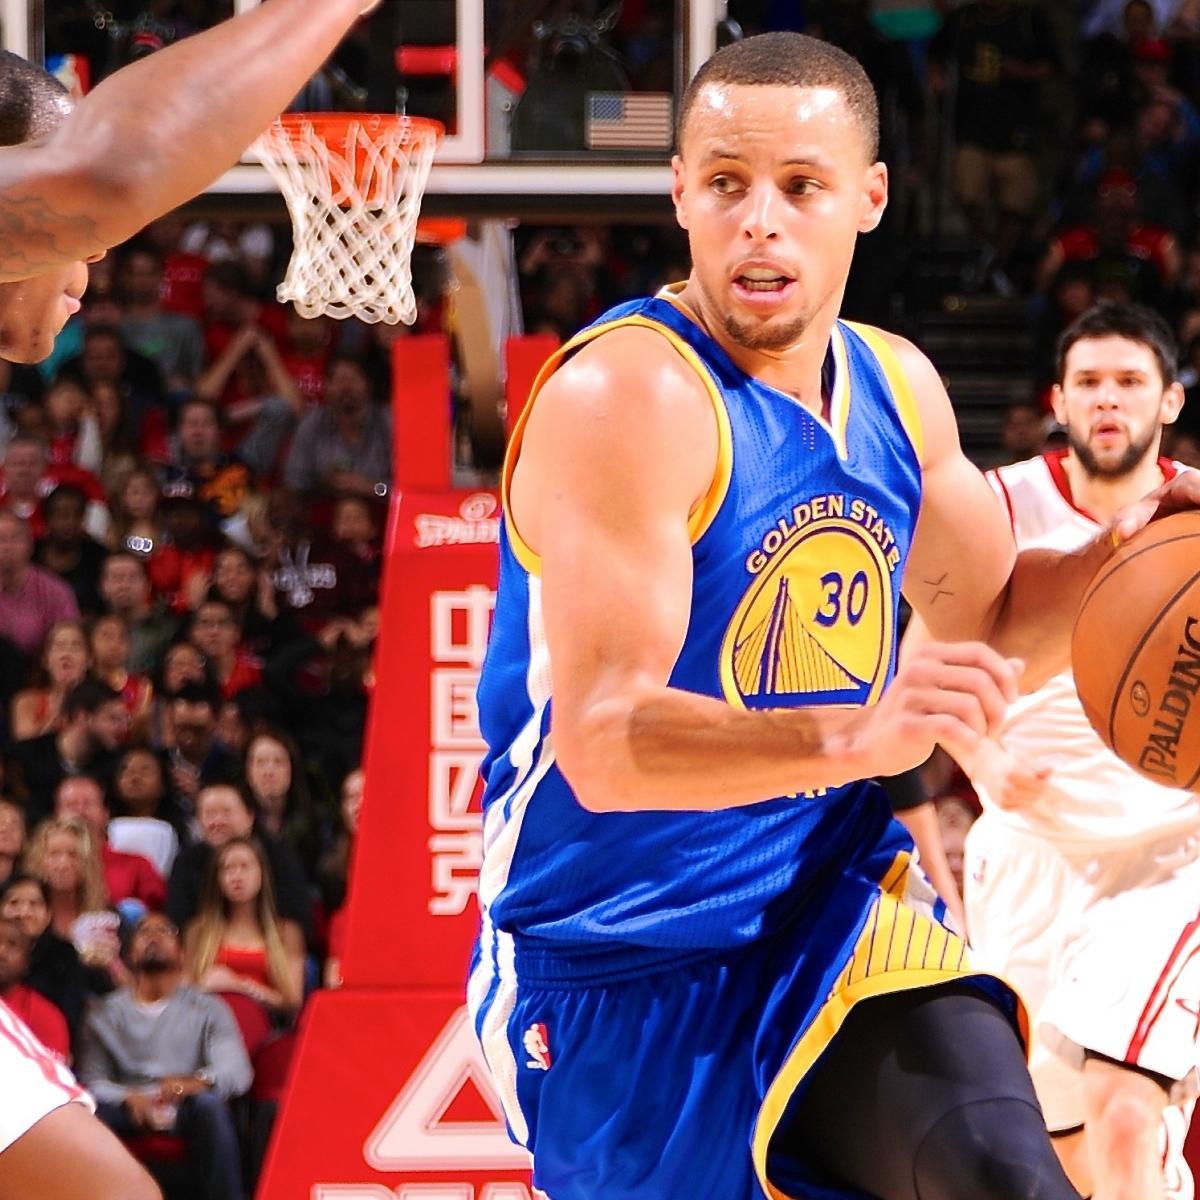 Rockets Vs Warriors May 24: Golden State Warriors Vs. Houston Rockets: Live Score